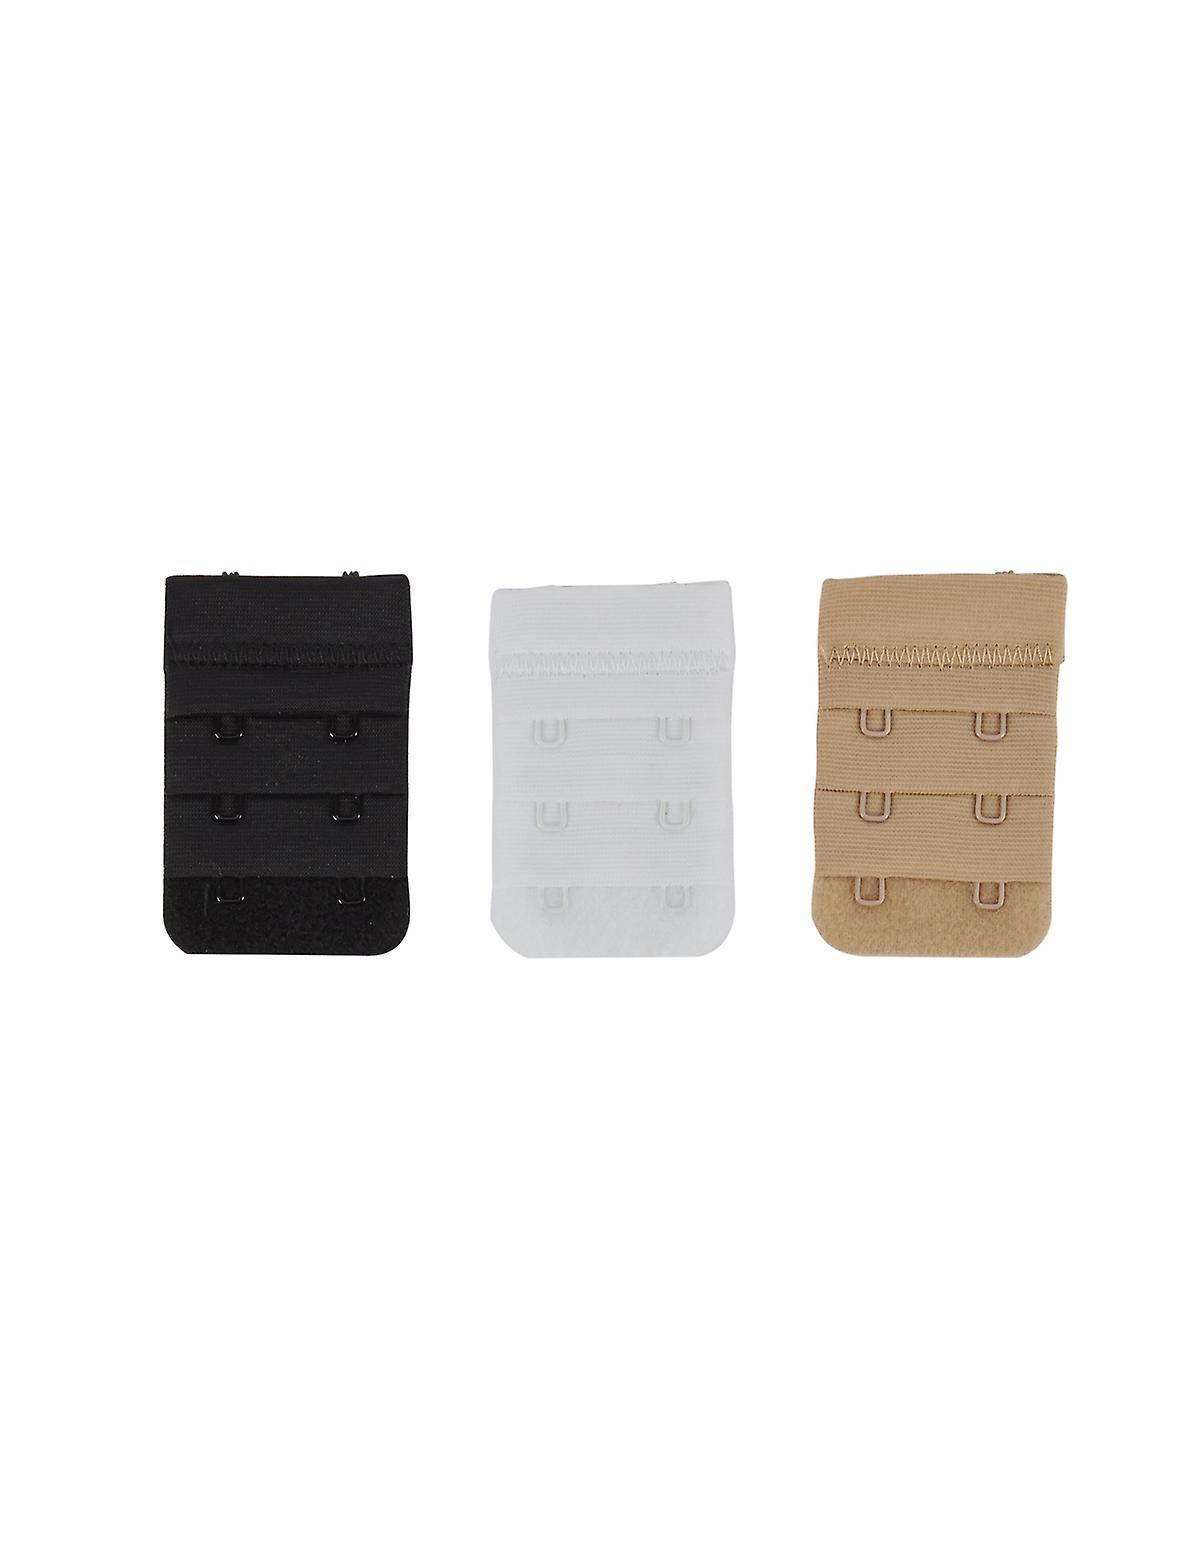 Secret Weapons SW-029-2-3P Women's Bra Strap Extenders Assorted 3 Pack